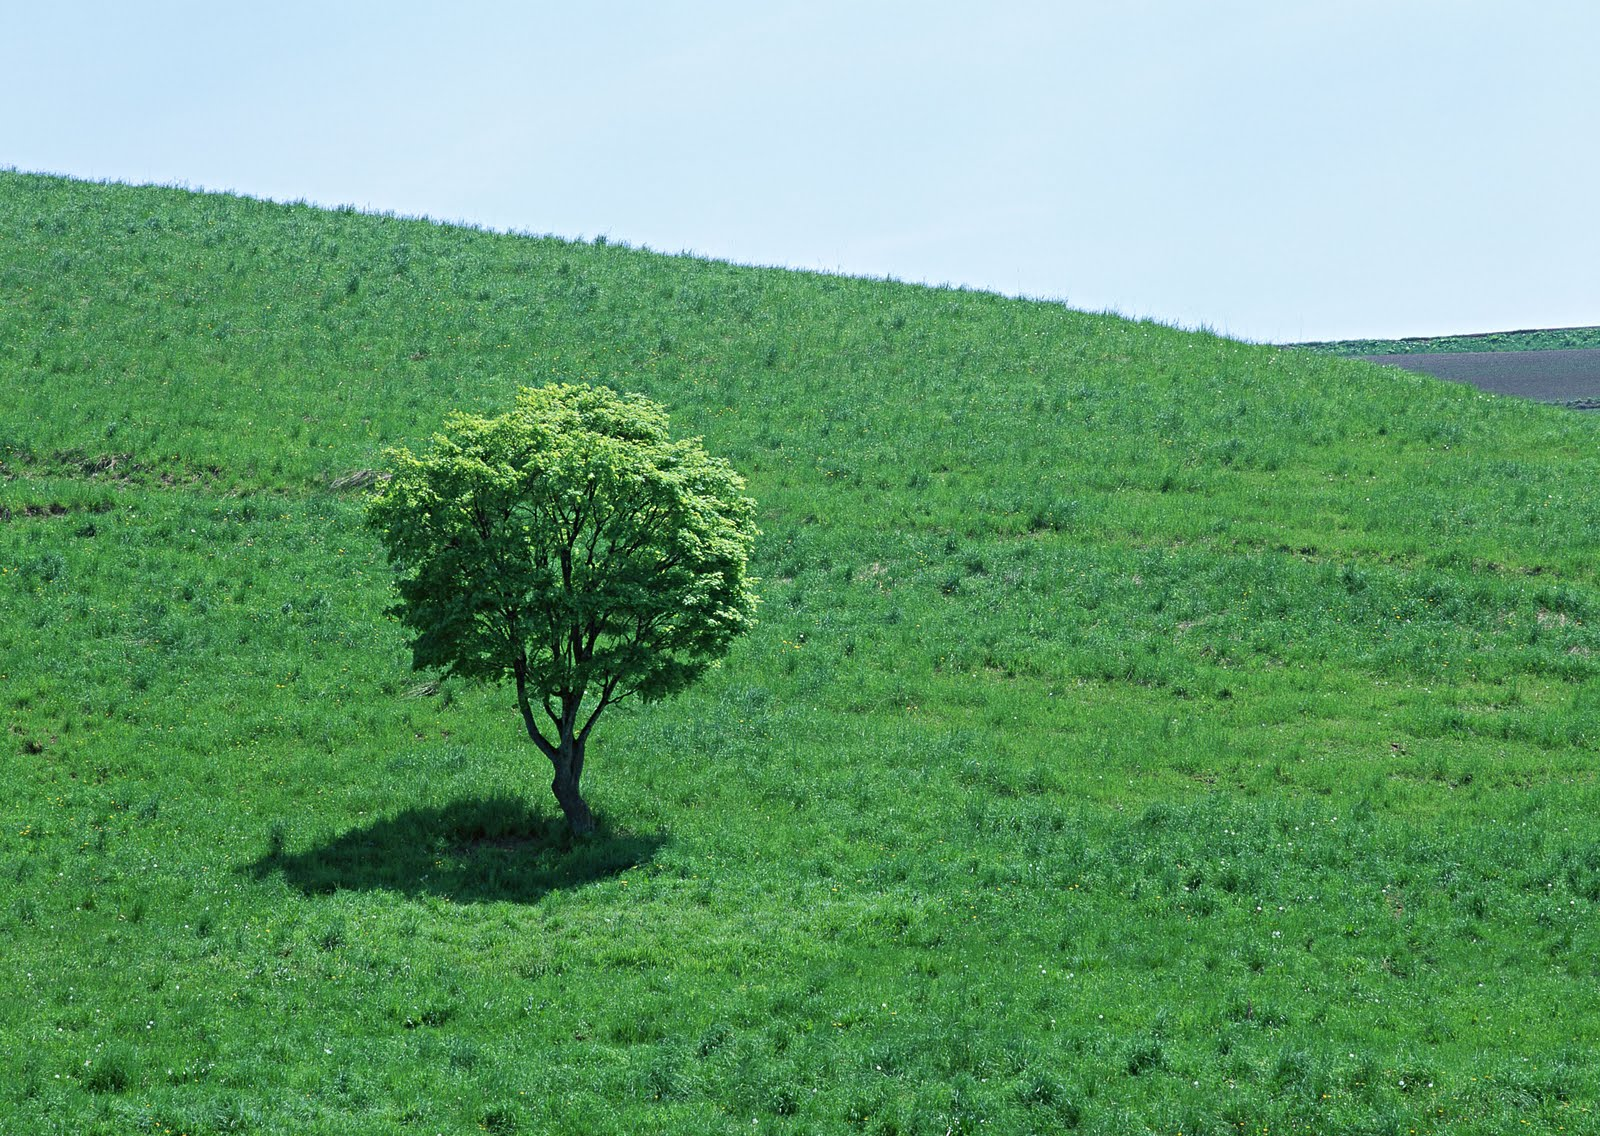 http://1.bp.blogspot.com/_rGZ14Dv3CBU/S92gft8ryAI/AAAAAAAAA-w/FChQLJoiYYI/s1600/Free+Tree+Wallpaper+%2841%29.JPG